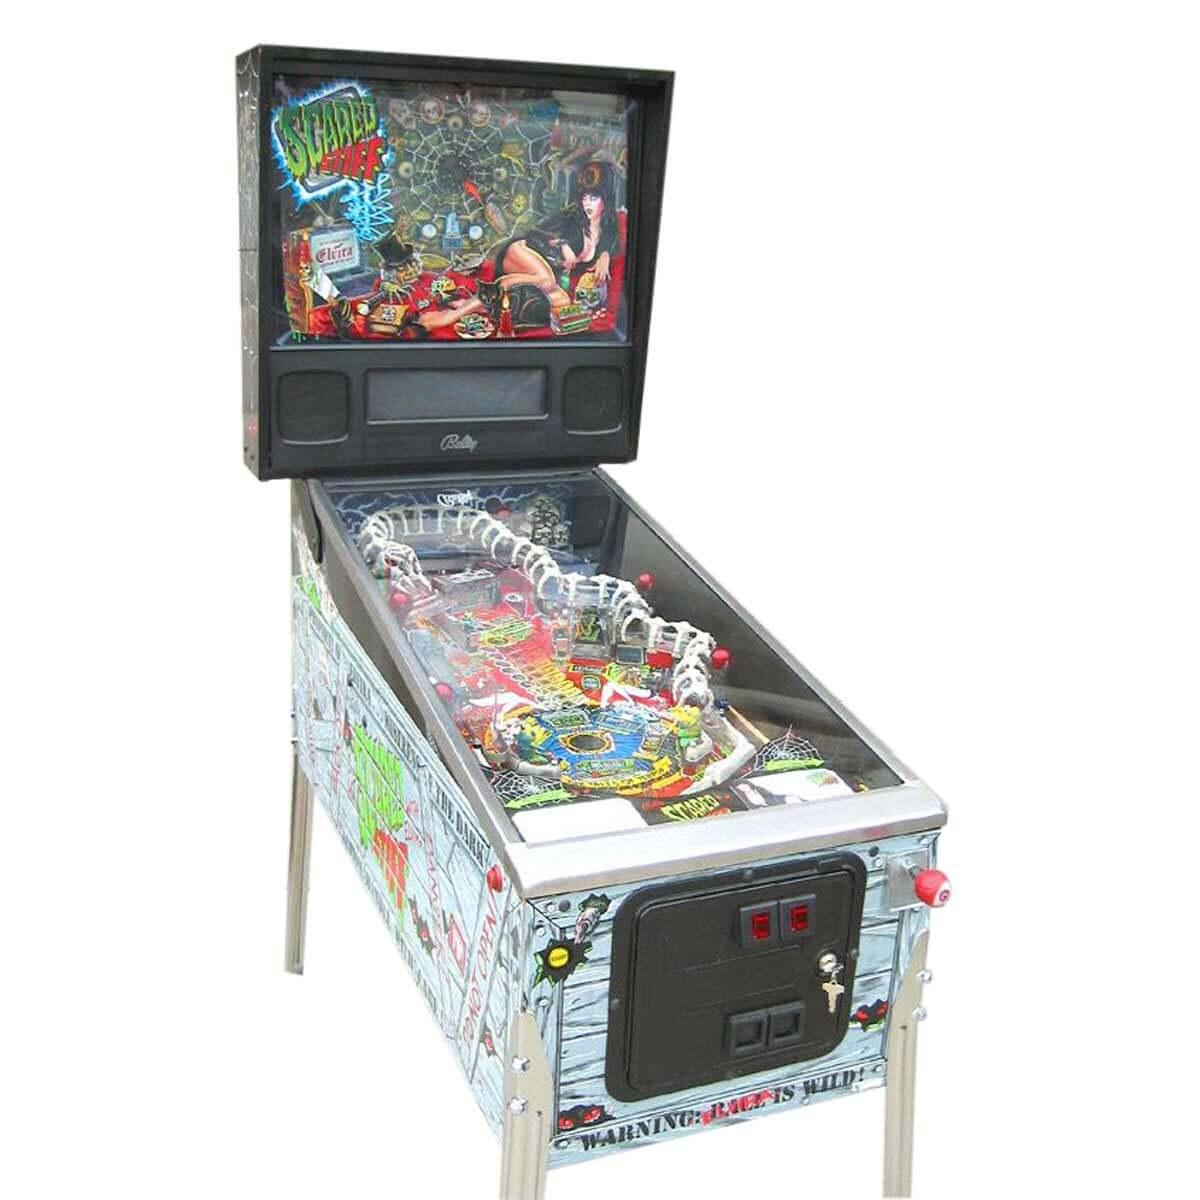 Buy Scared Stiff Pinball Machine By Bally Online At 8999